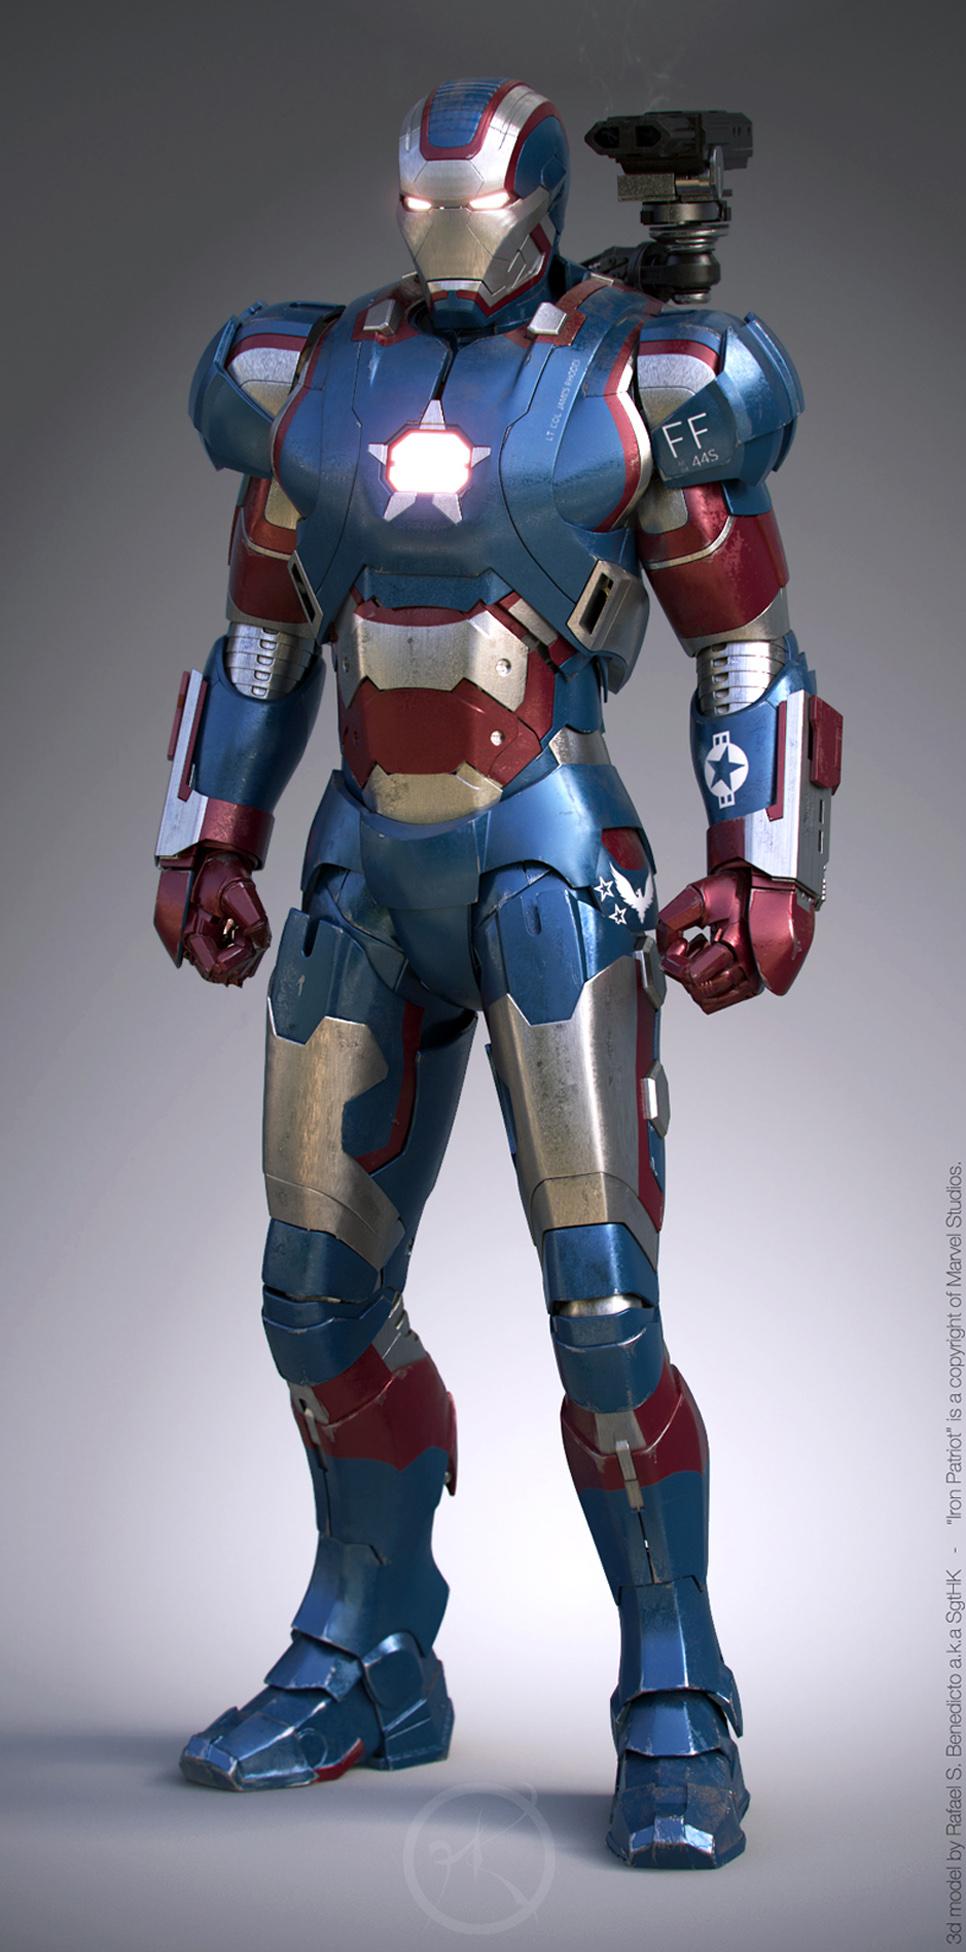 image iron man 3 iron patriot iron man wiki fandom powered by wikia. Black Bedroom Furniture Sets. Home Design Ideas